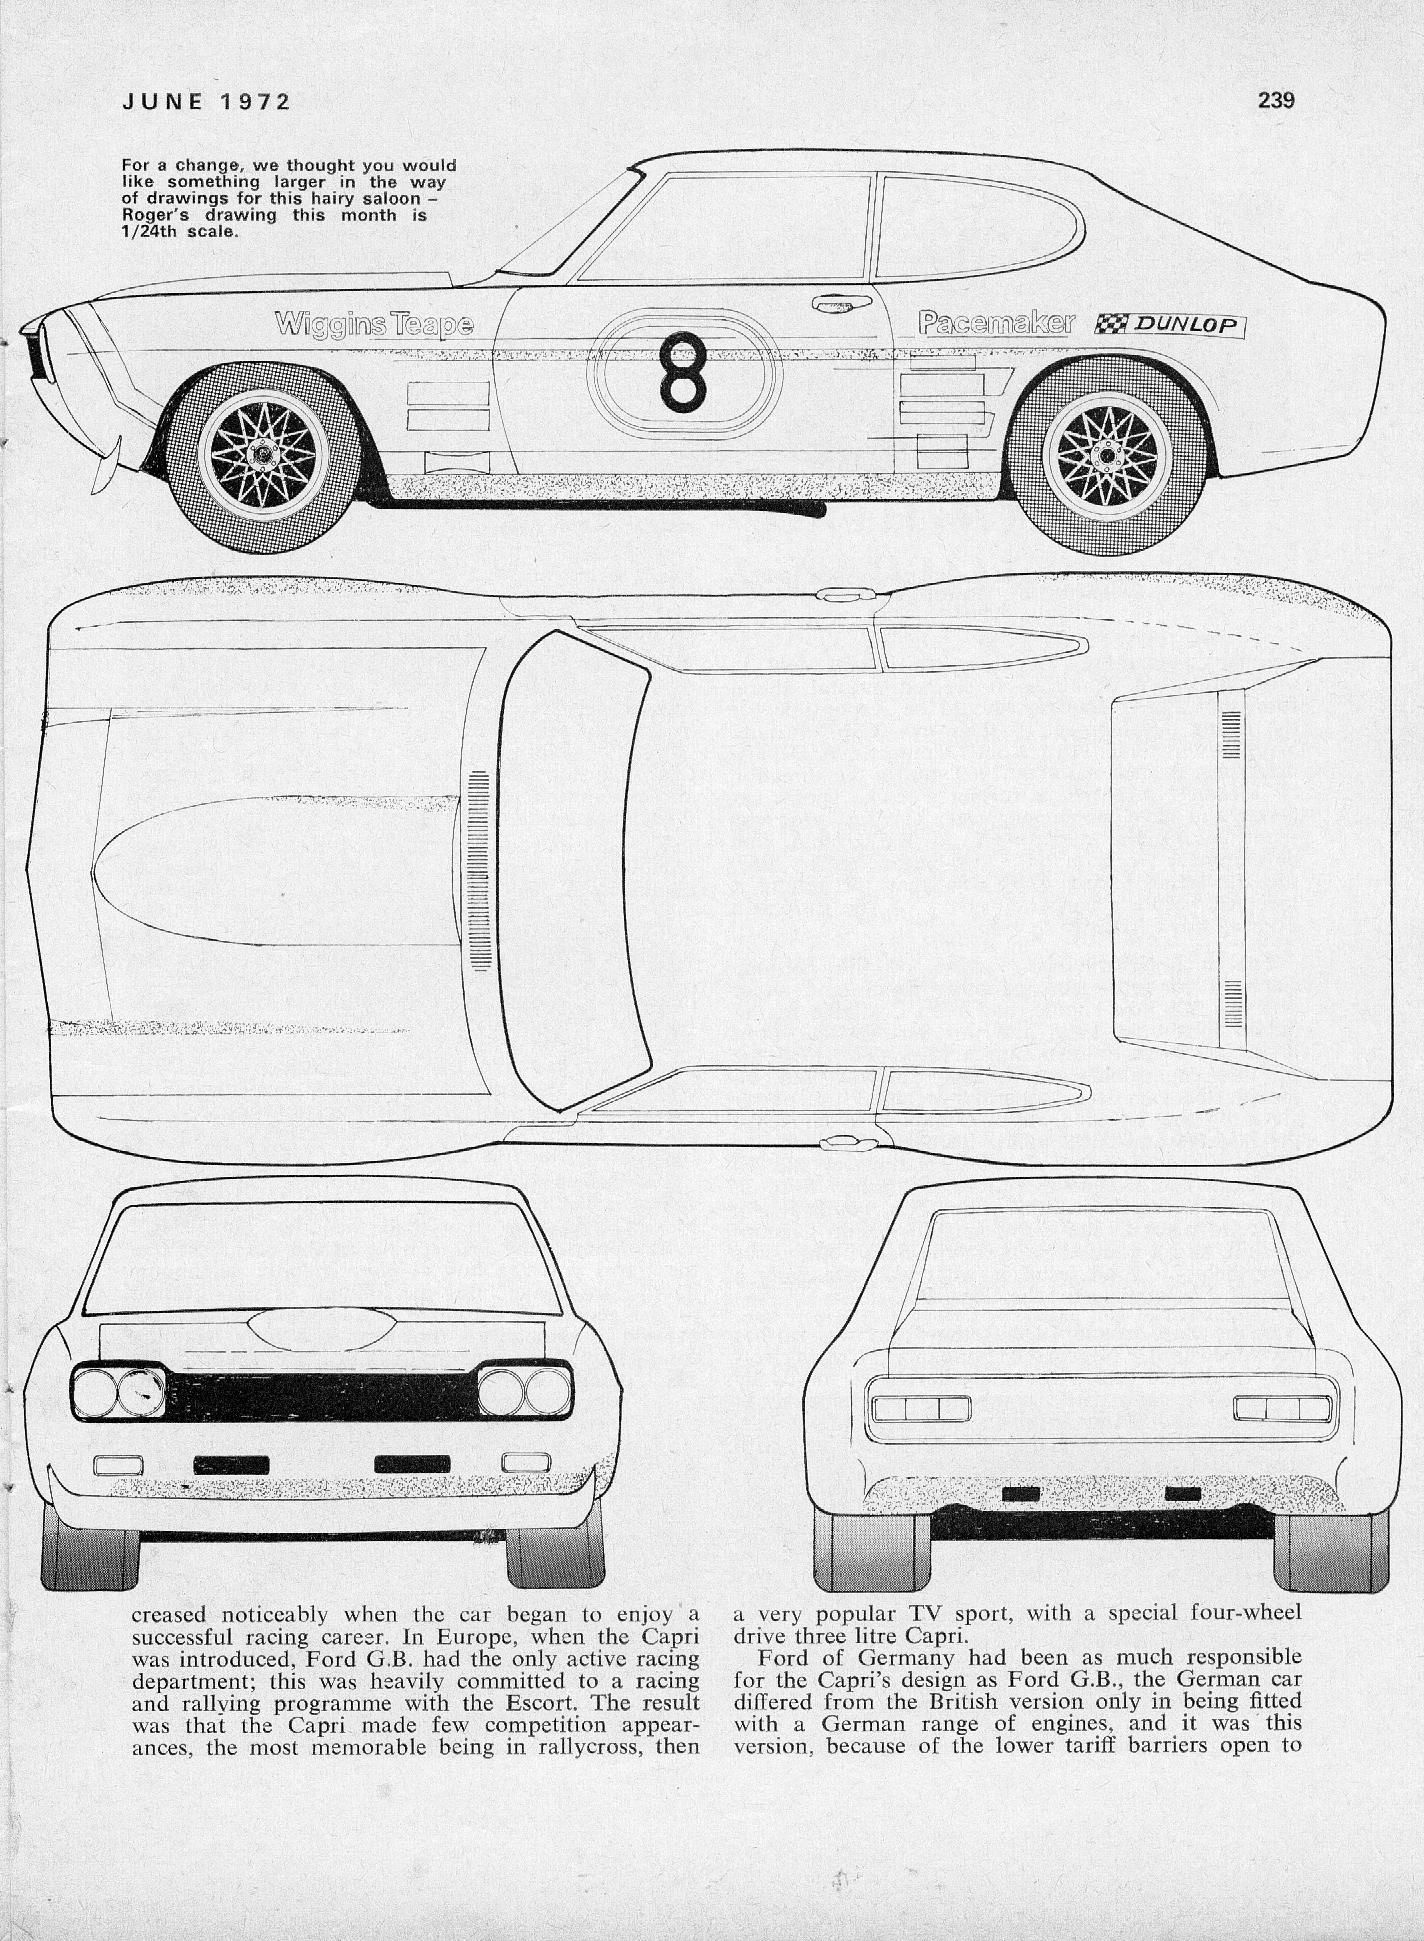 Ford capri 2600 rs racing car blueprint pinterest dibujos ford capri 2600 rs malvernweather Choice Image